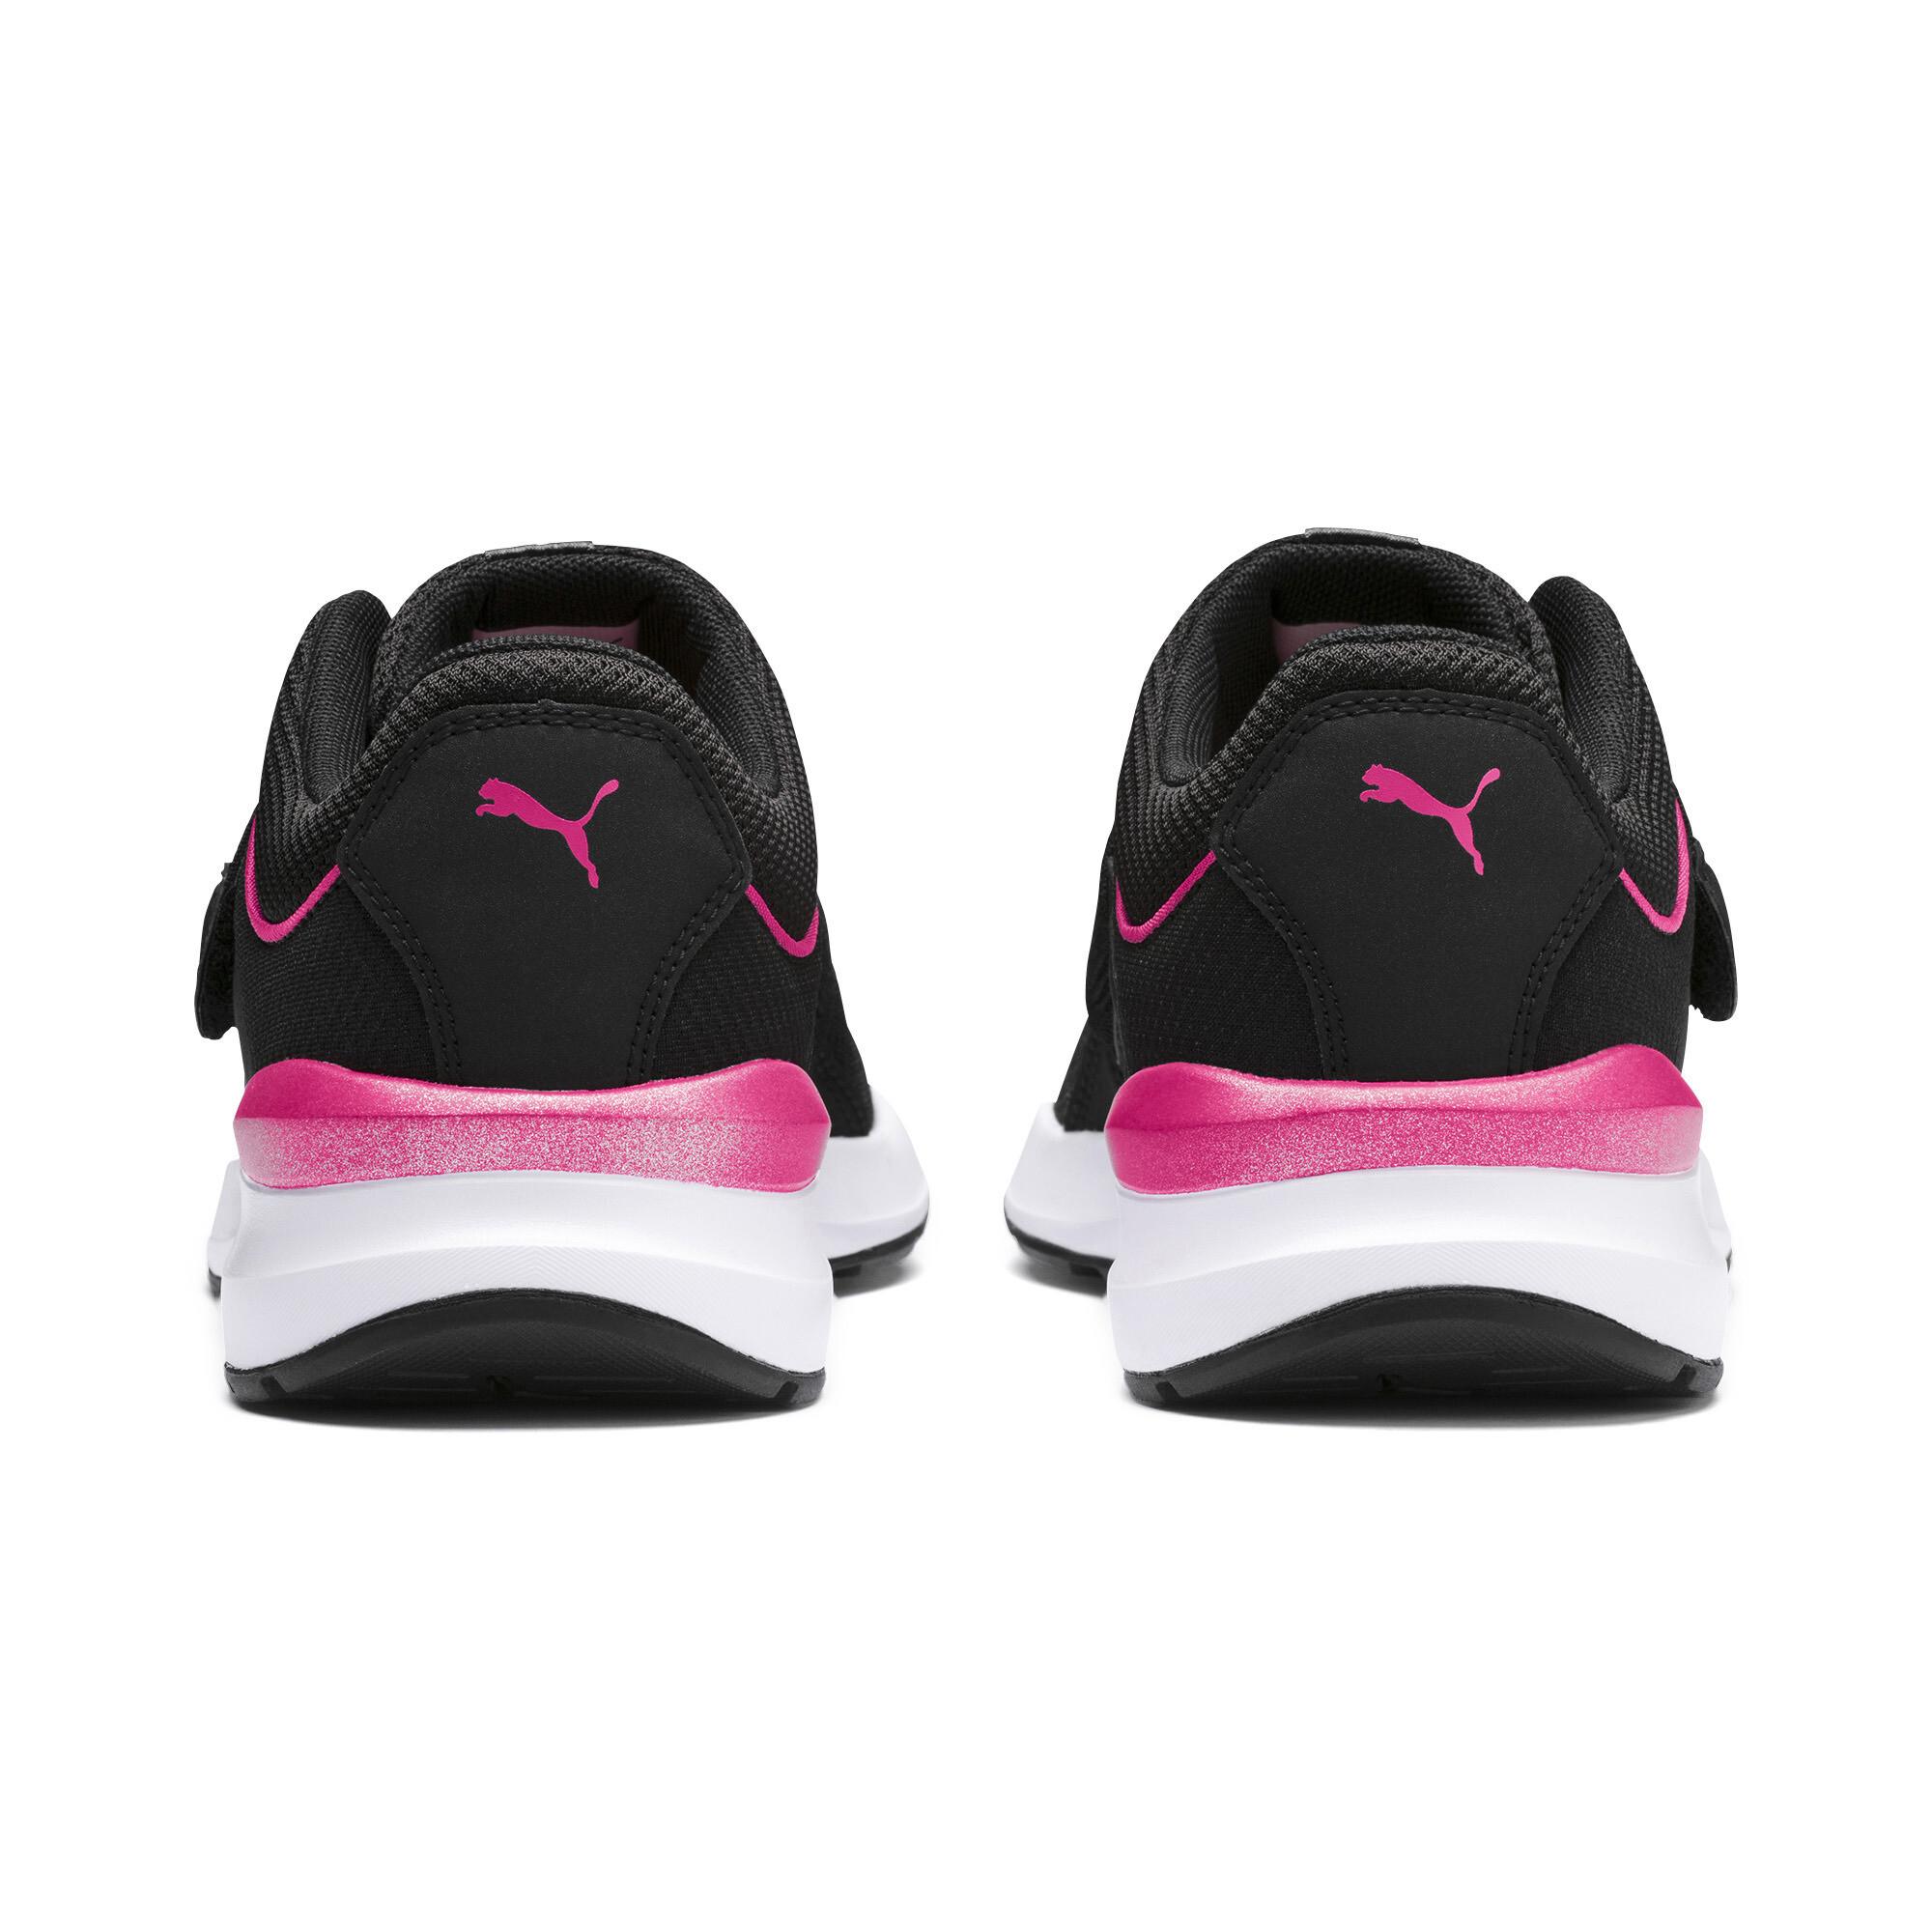 PUMA-Adela-X-Women-s-Sneakers-Women-Shoe-Basics thumbnail 8